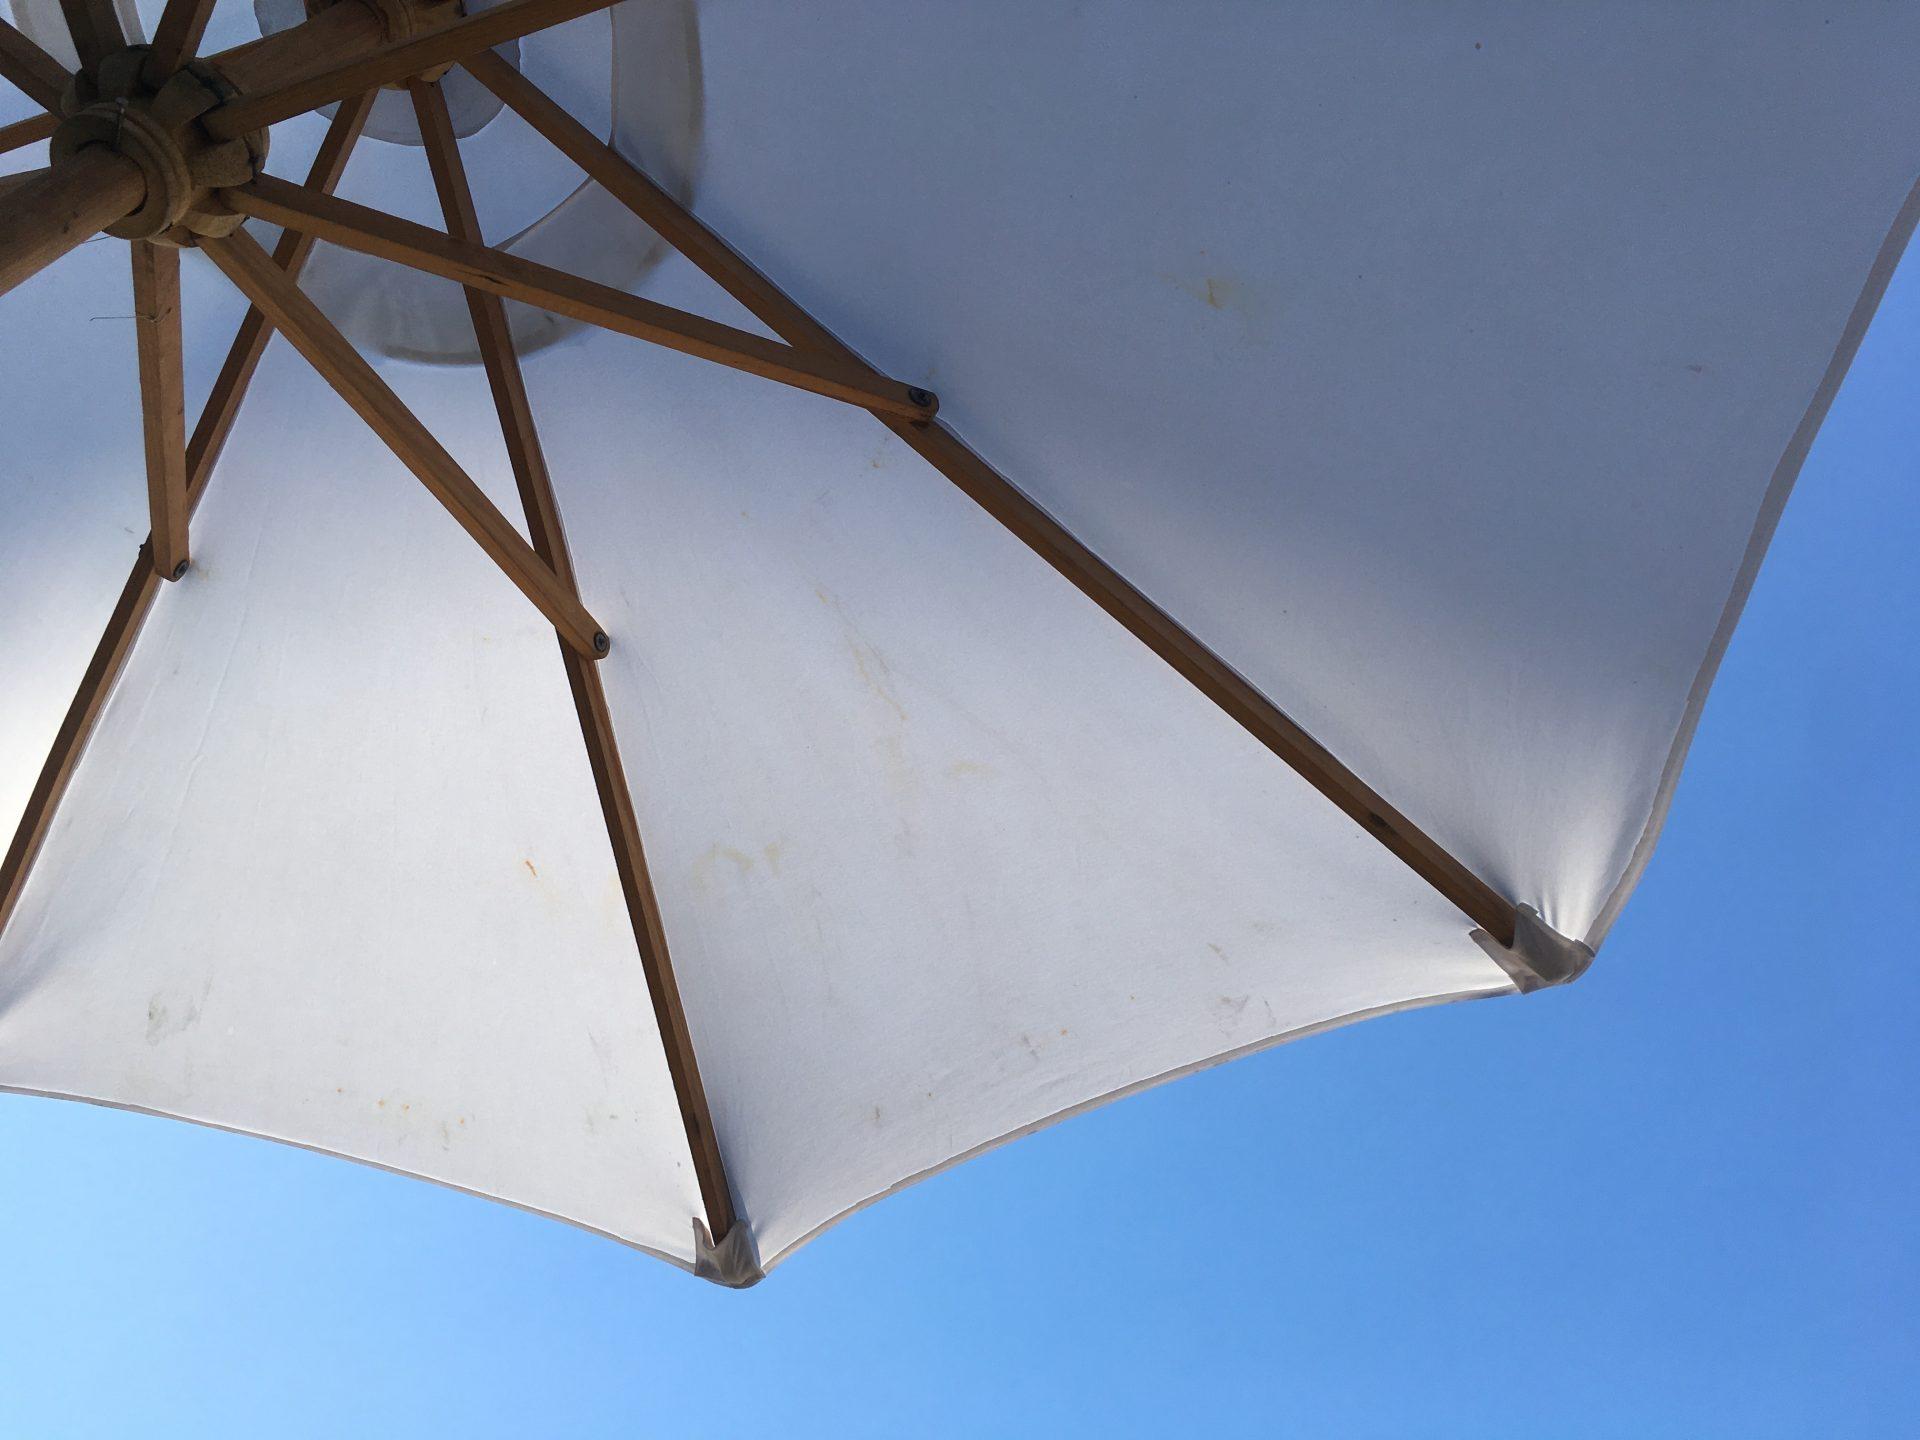 aldo terrazas OaHkLW3GOz4 unsplash e1582796984392 - Professionelle parasoller til ethvert formål